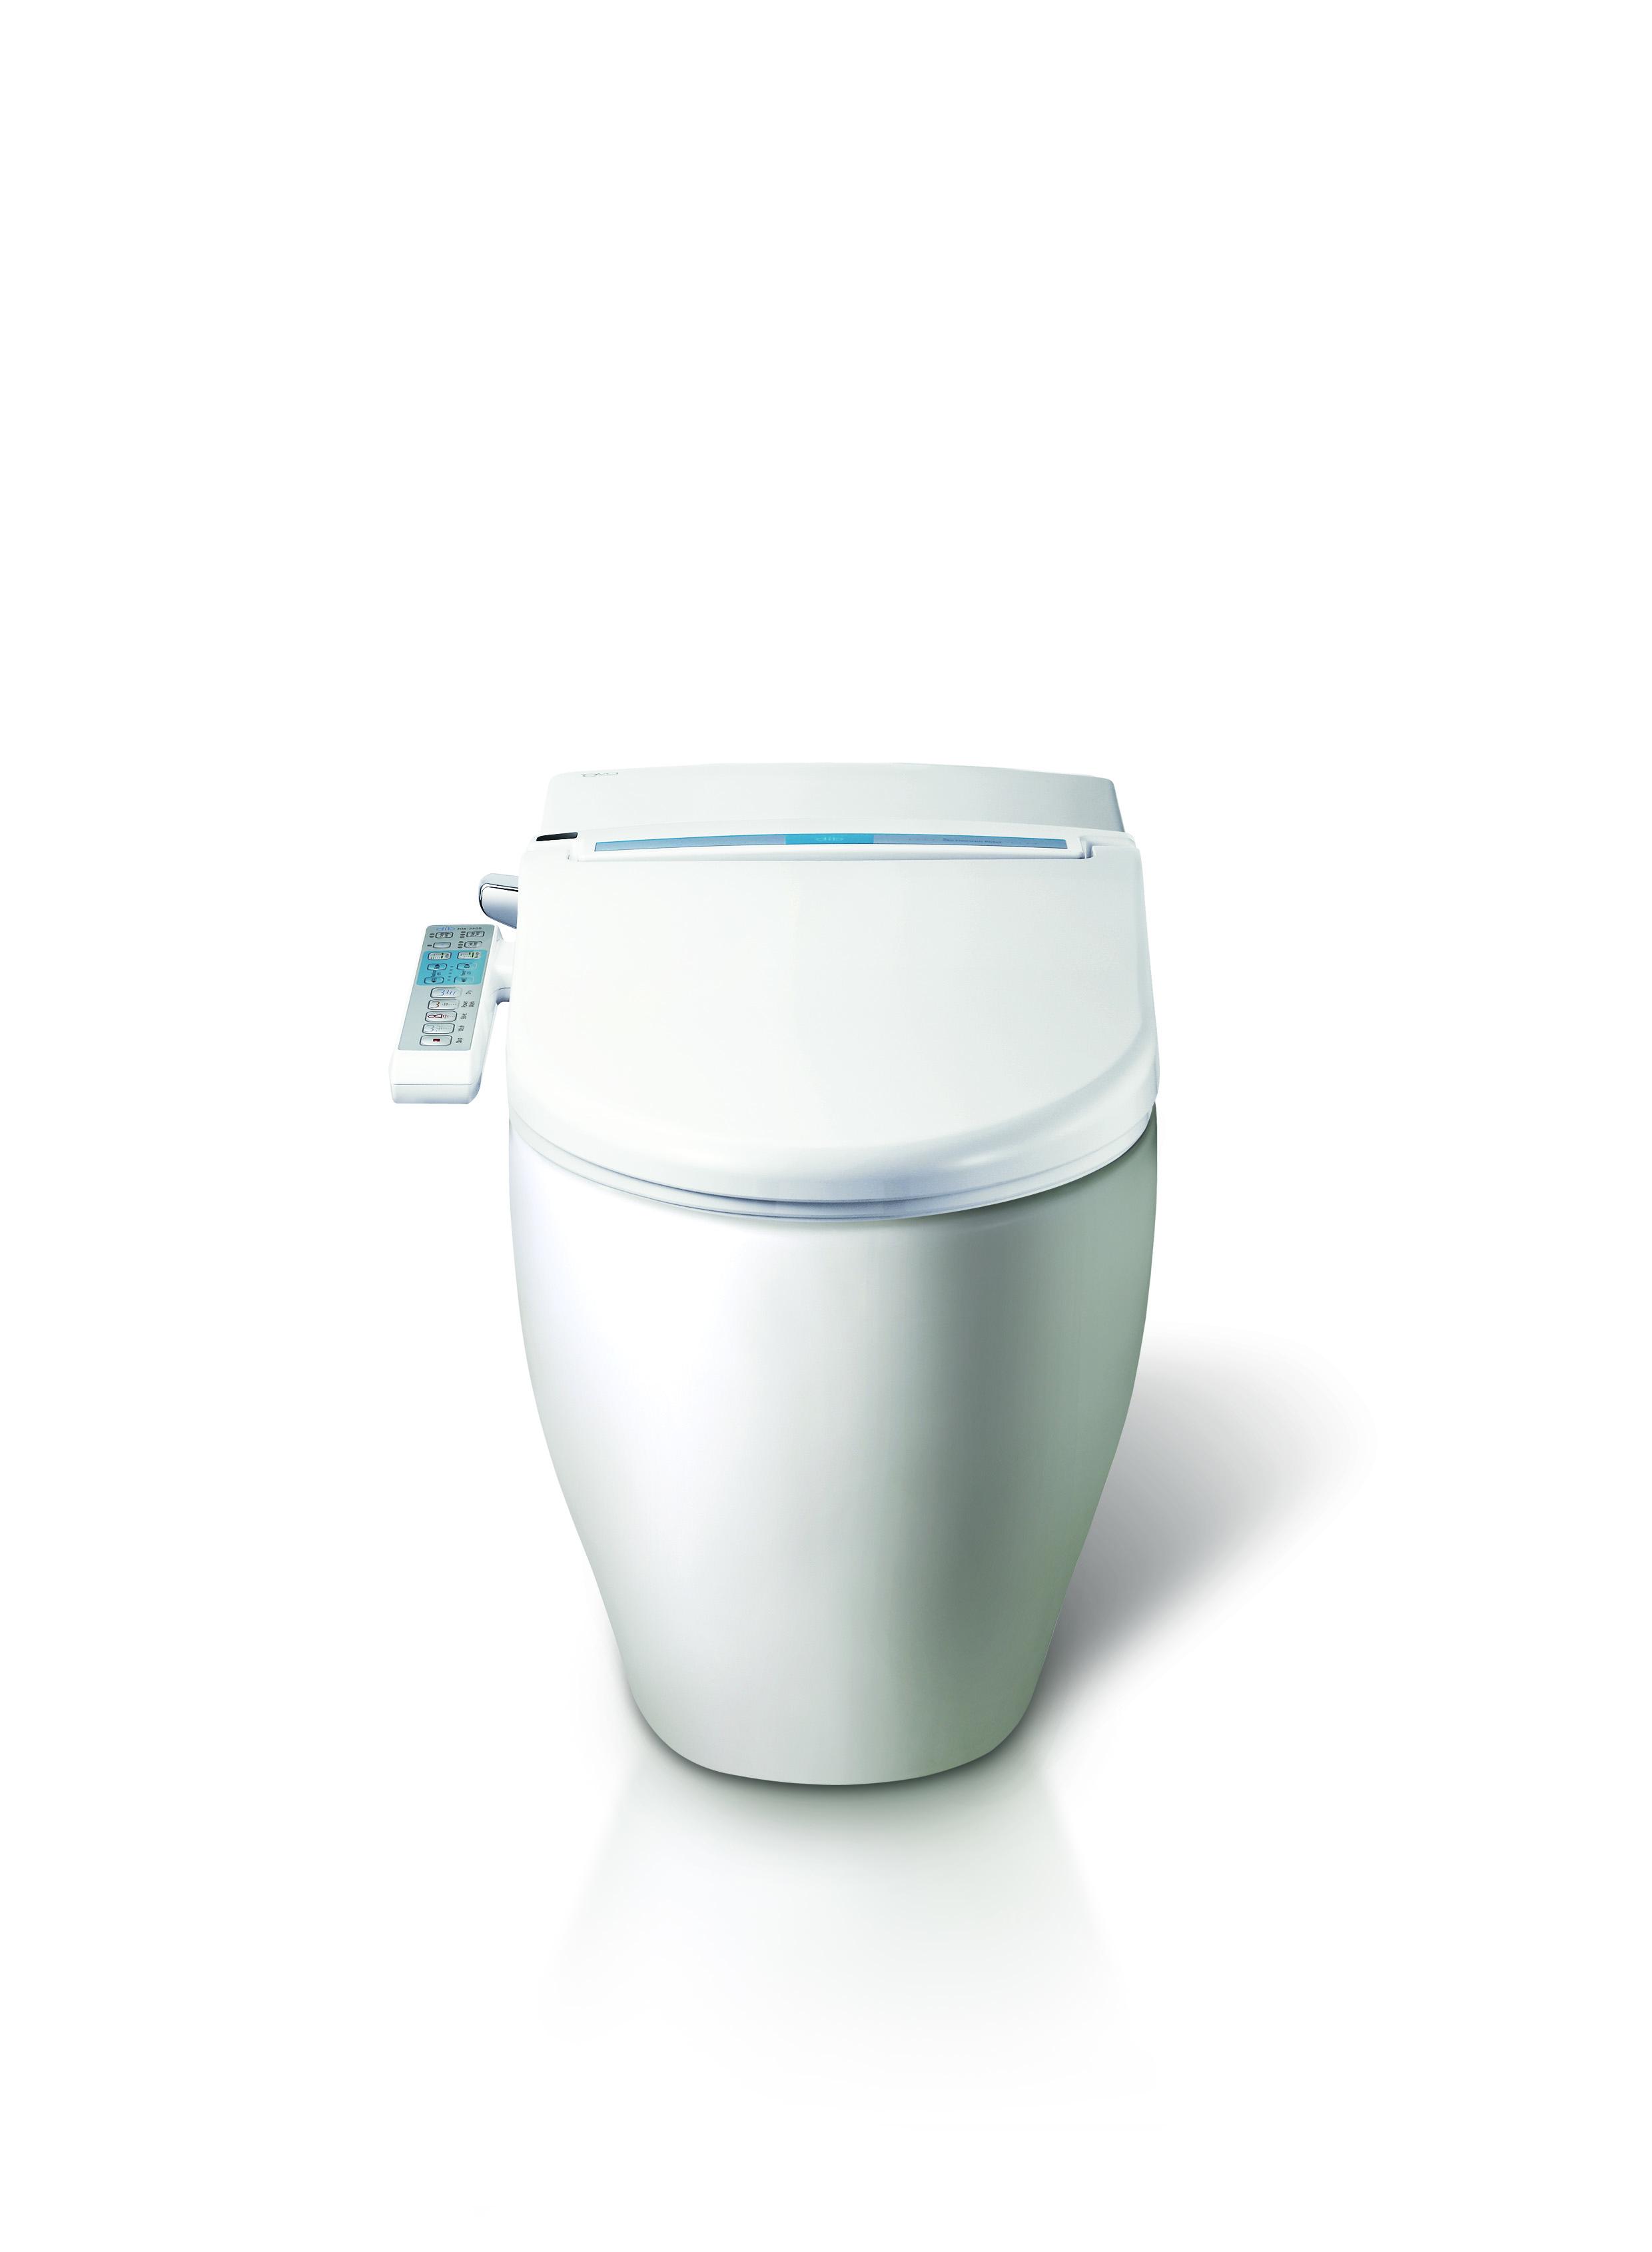 Dib2500 Auto Bidet Spa Luxury Electronic Toilet Seat Bidet Spa Dib 2500 249 00 Warehouse8 Com Online Shopping For Stand Mixer Hearing